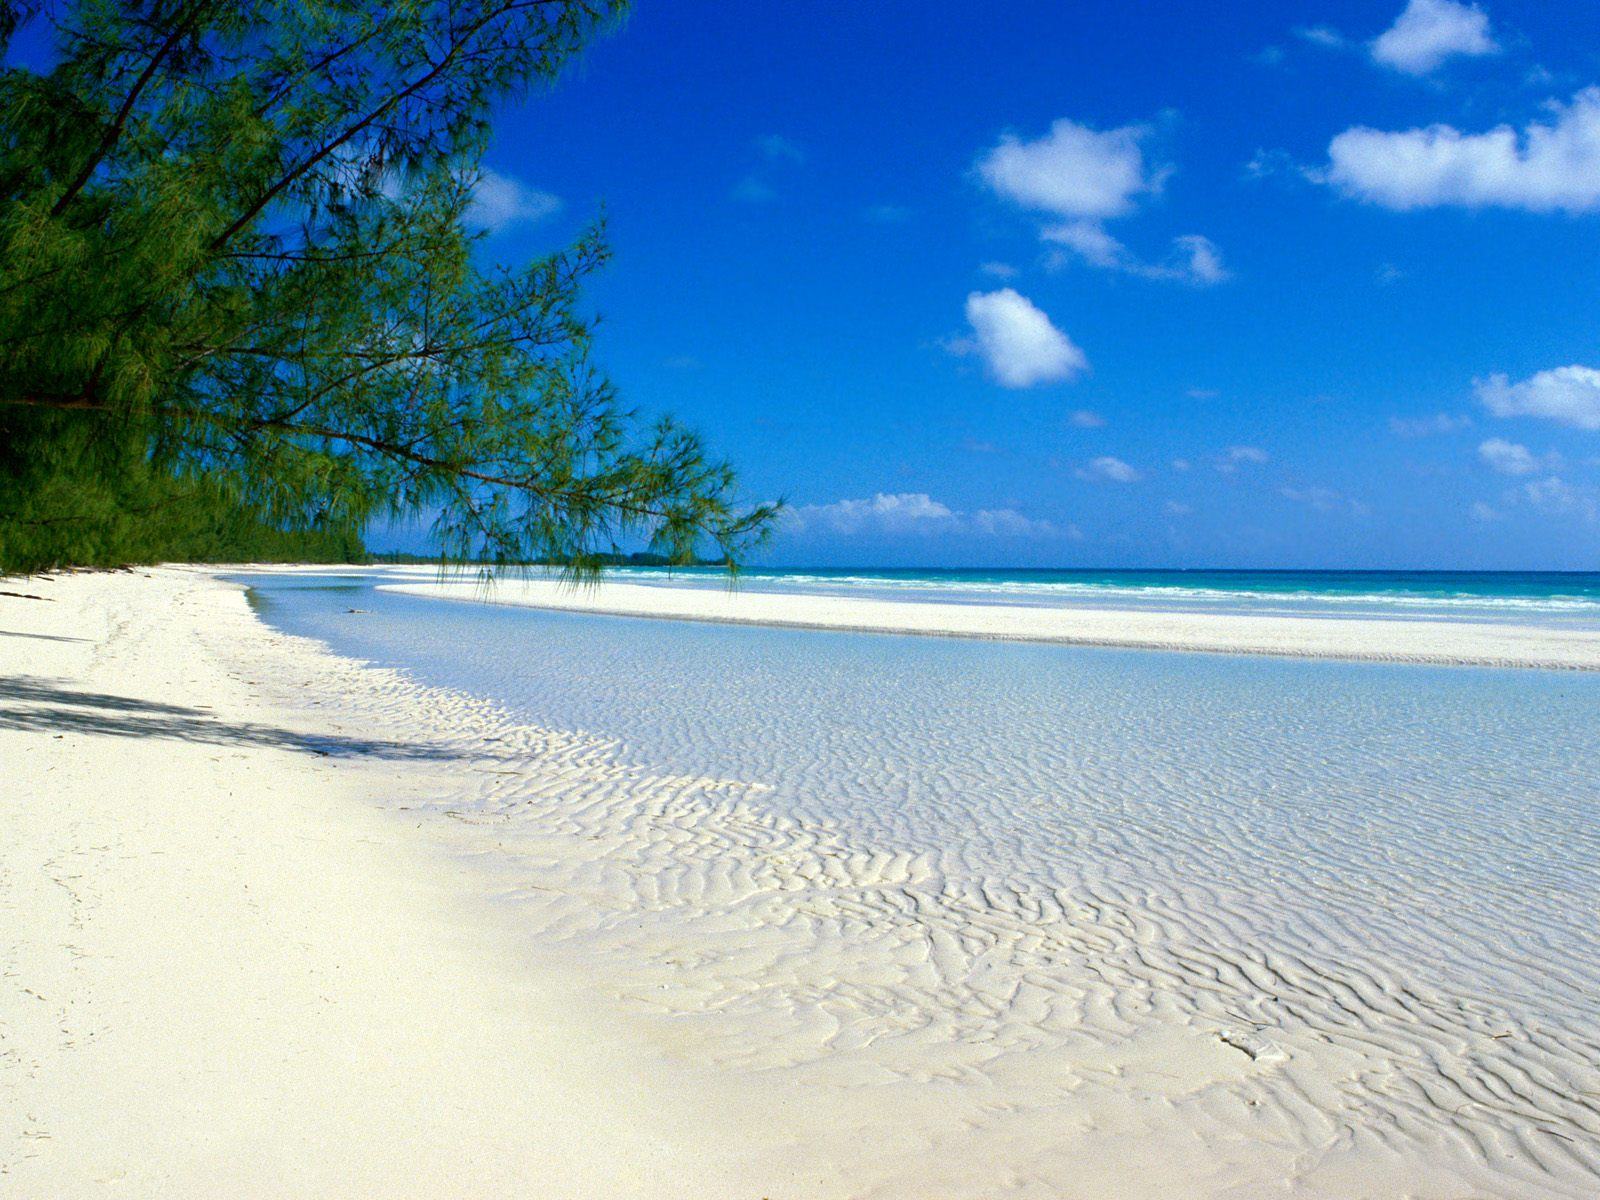 http://2.bp.blogspot.com/__1vmdDtDbmA/TE3MjpKoKoI/AAAAAAAAACI/ohbdjwaU7i4/s1600/photos-of-Taino-Beach-Bahamas-pictures.jpg